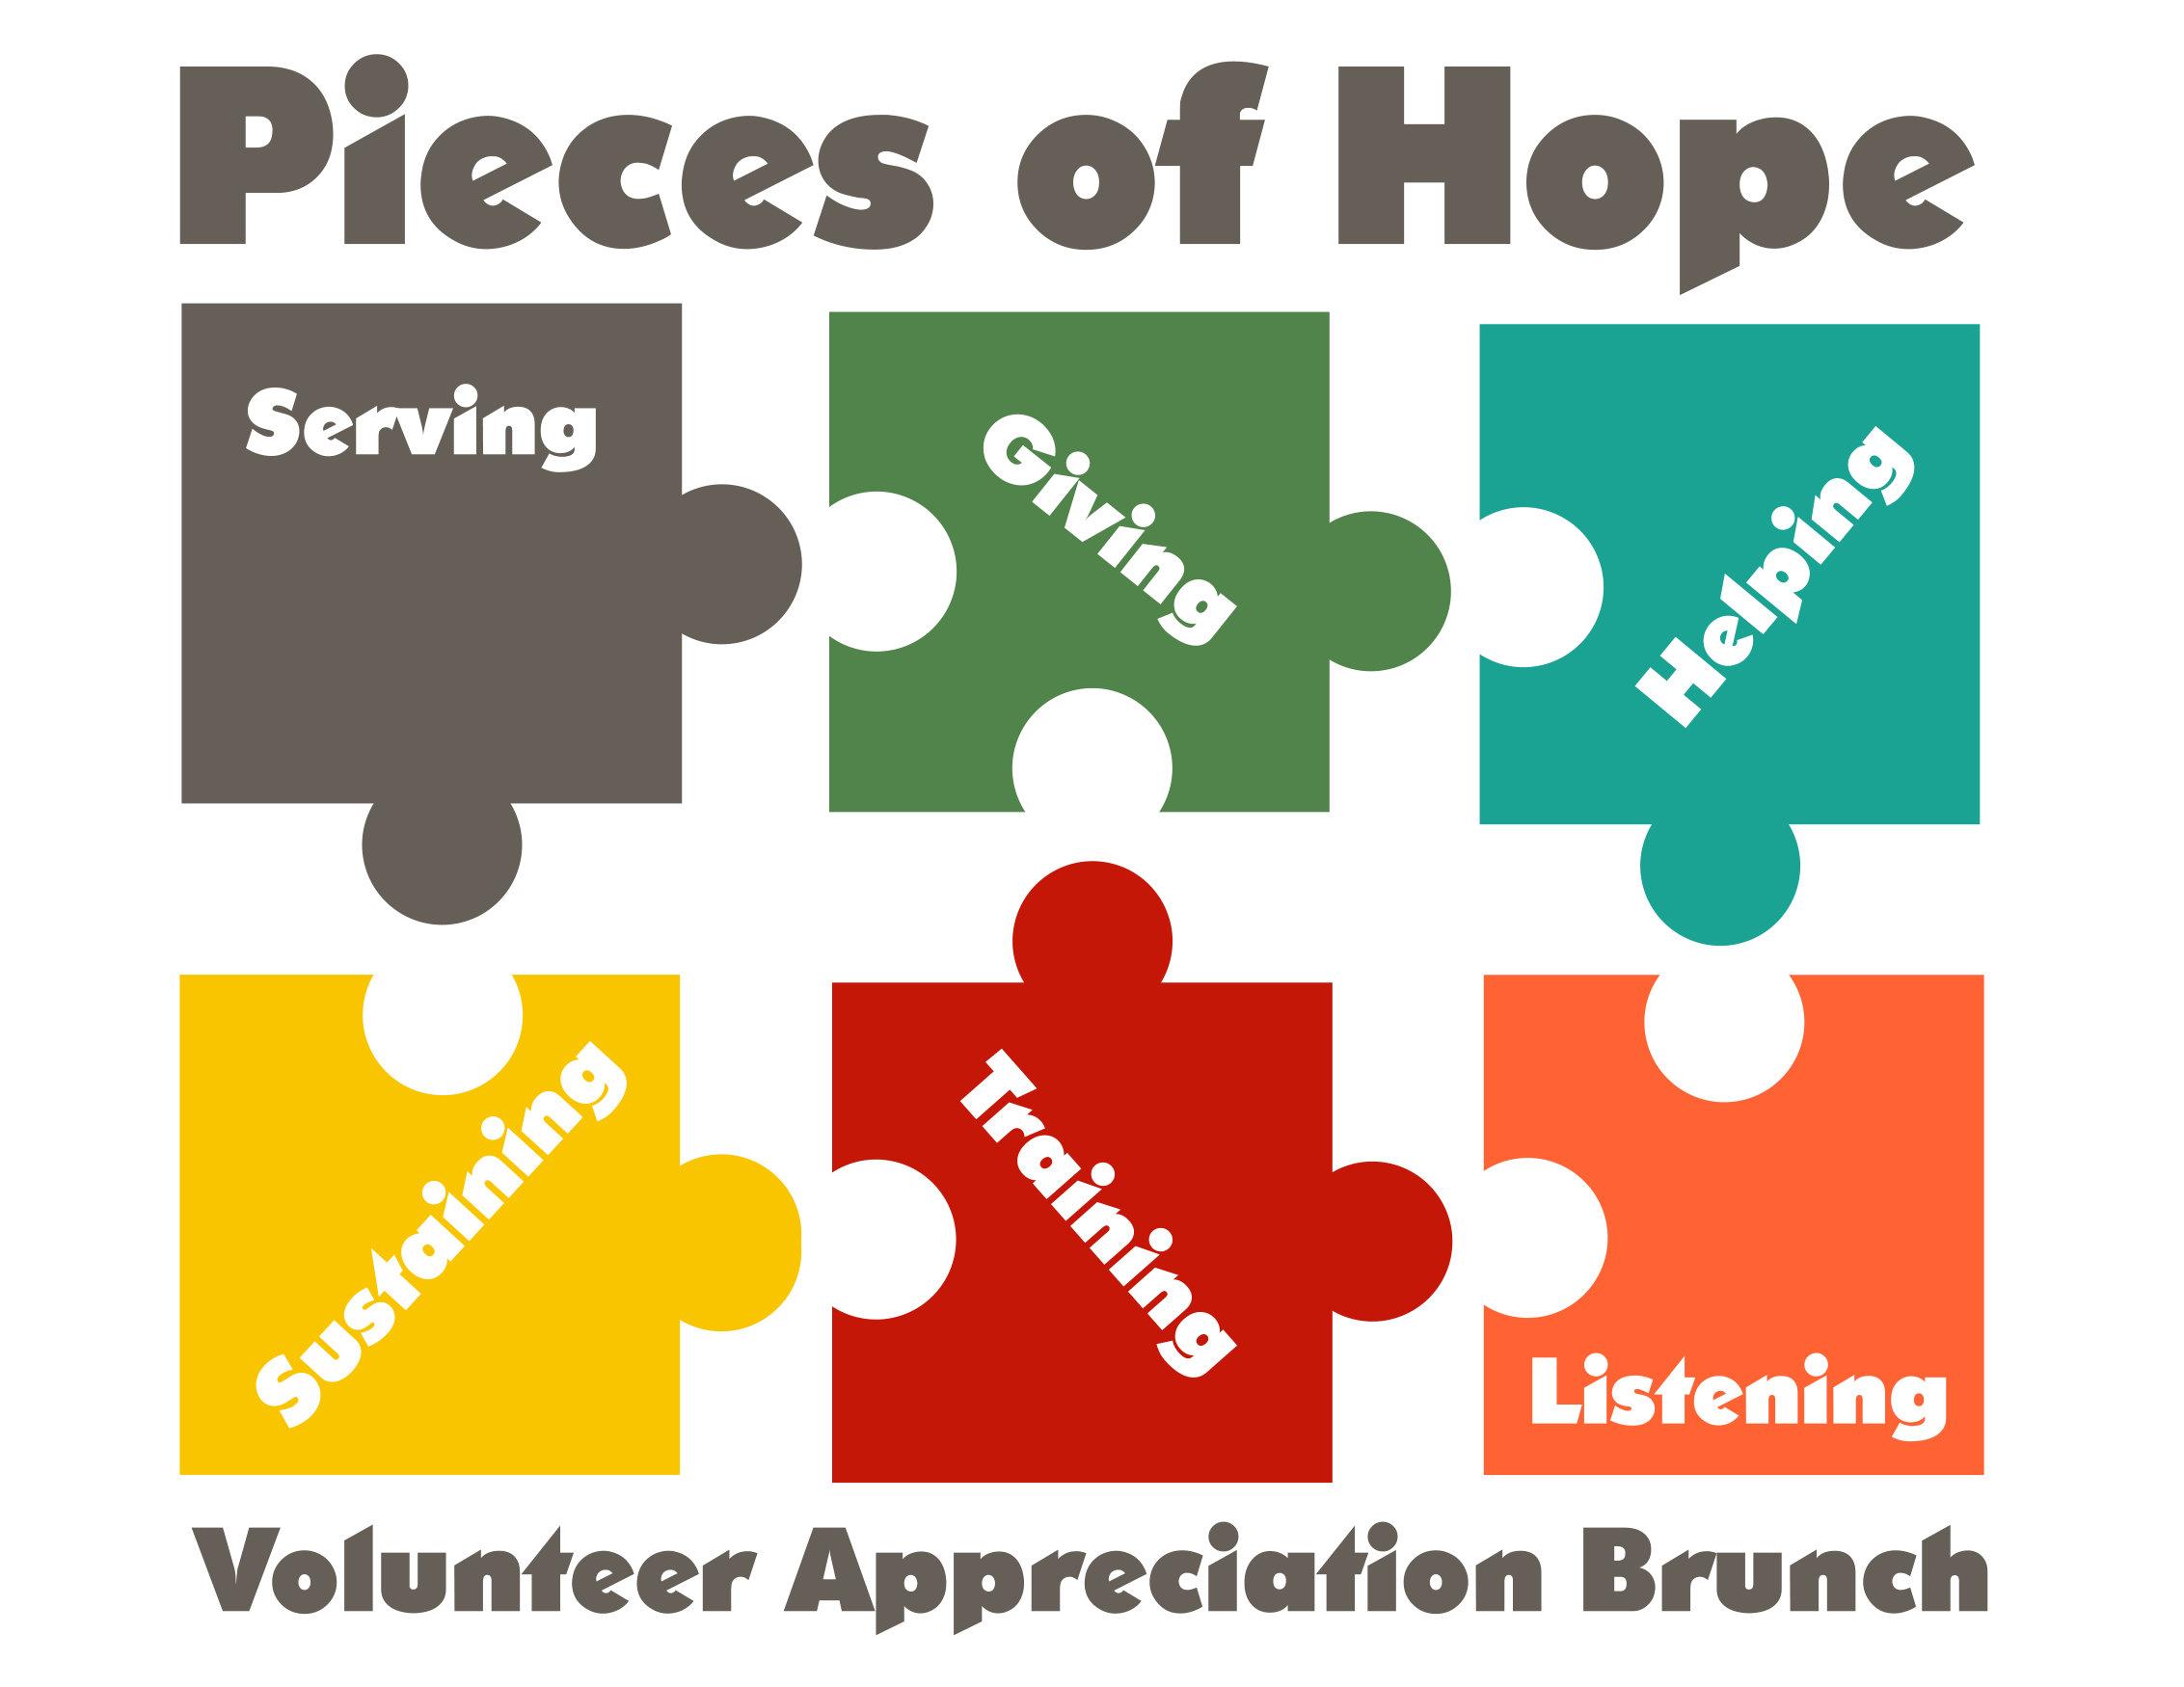 Volunteer Appreciation Brunch